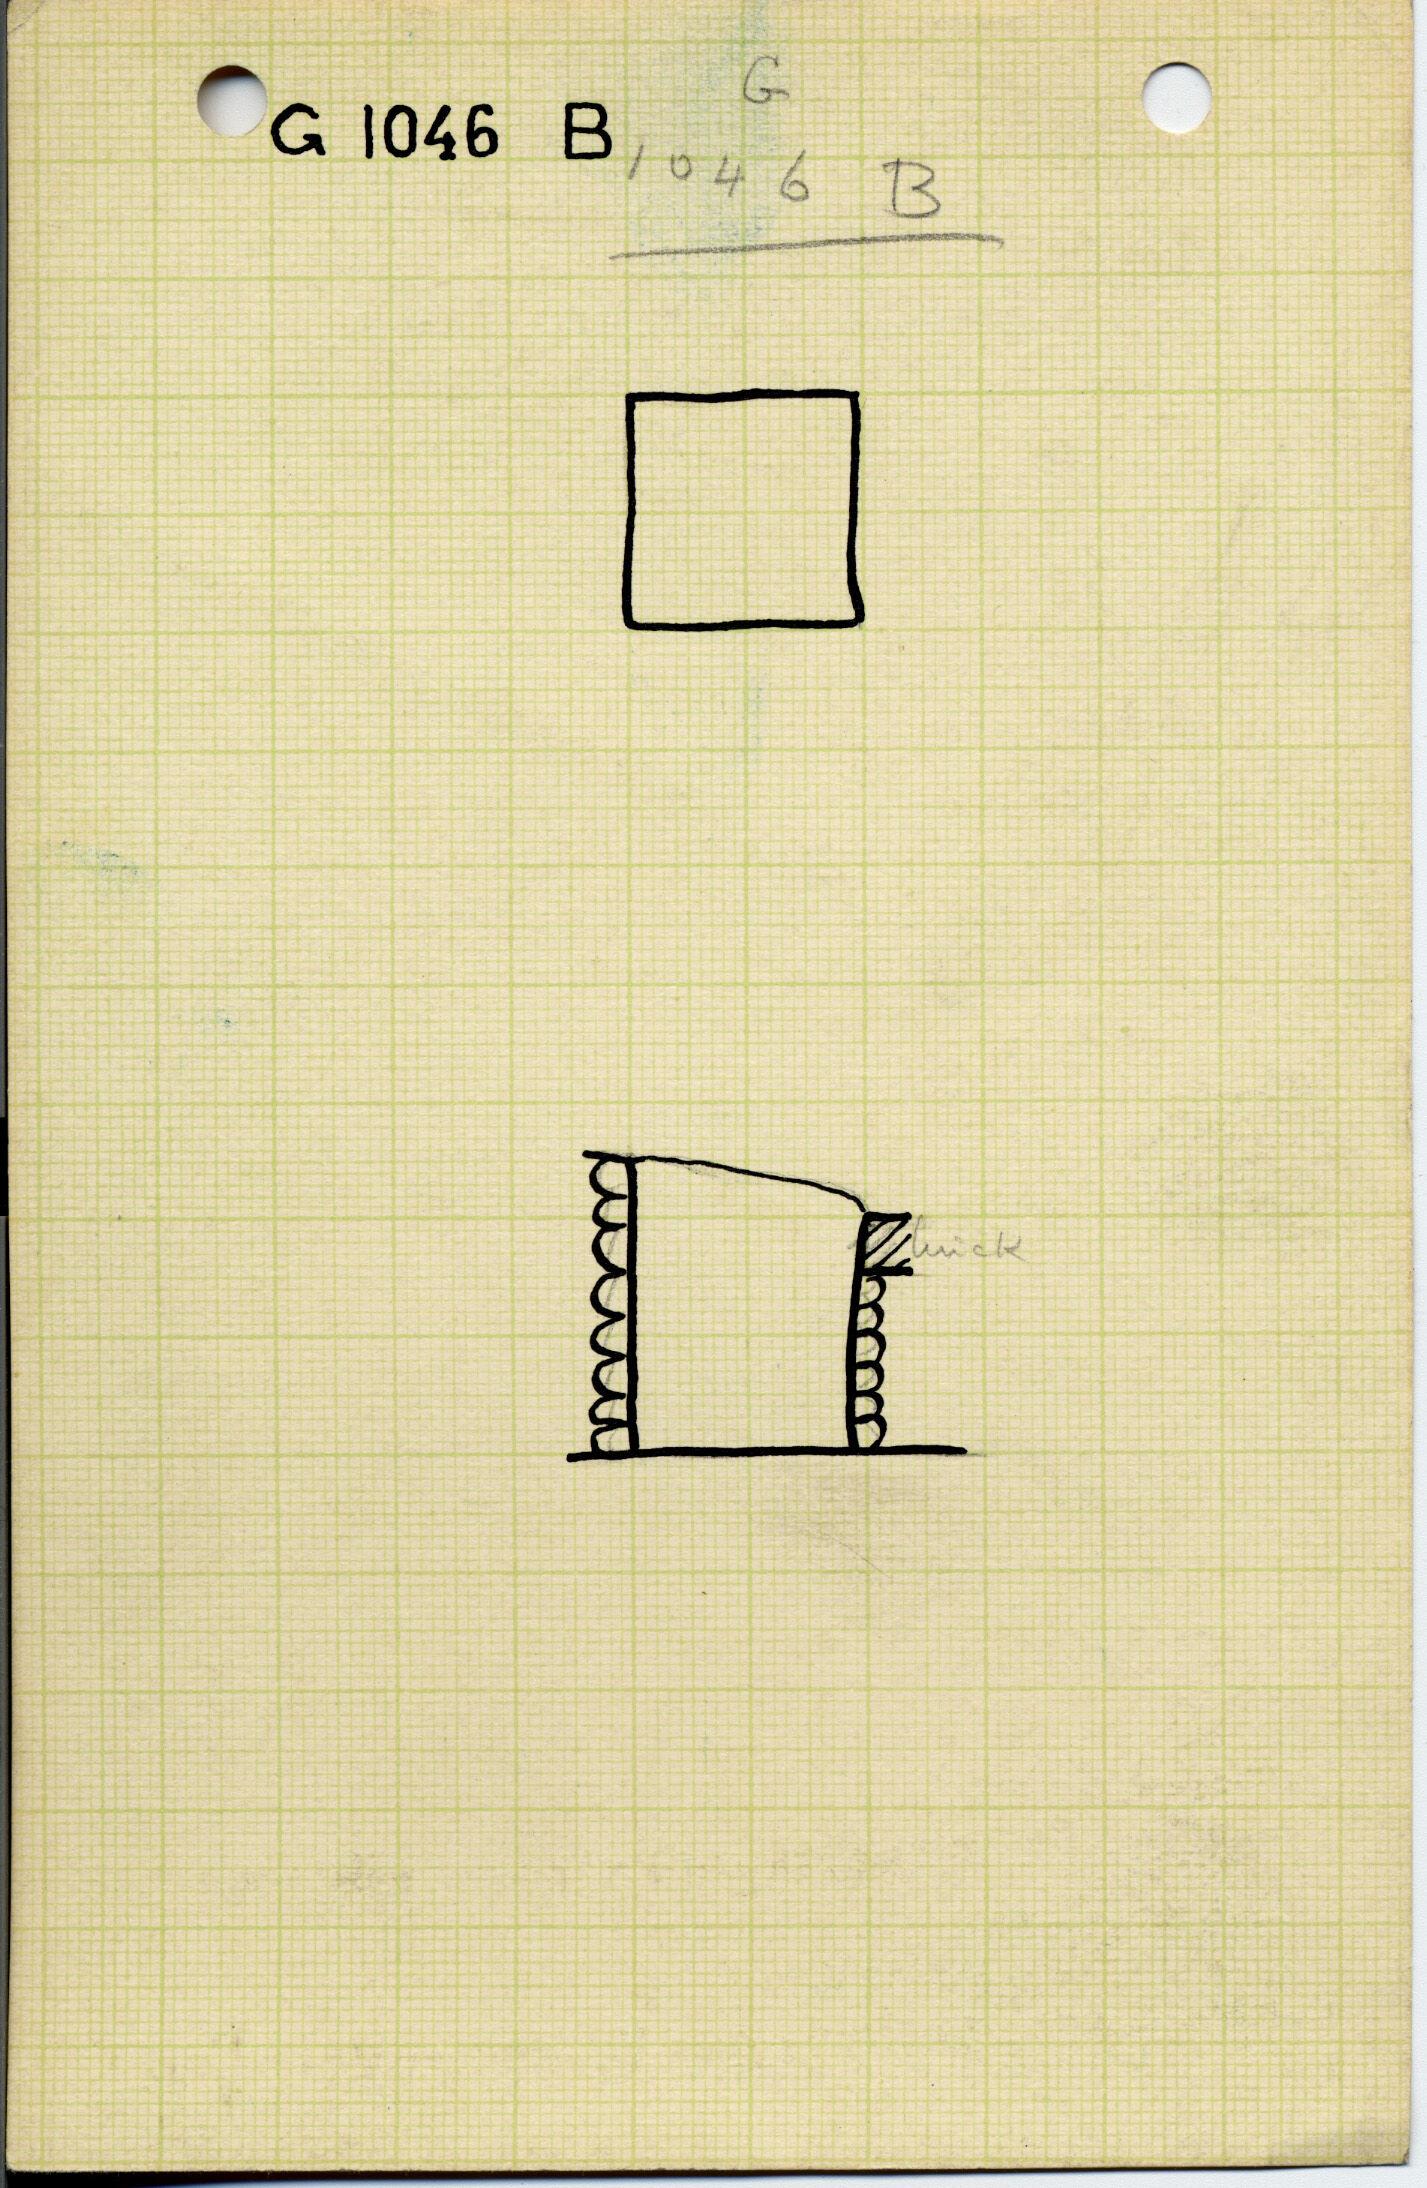 Maps and plans: G 1045+1046: G 1046, Shaft B (= Shaft F)